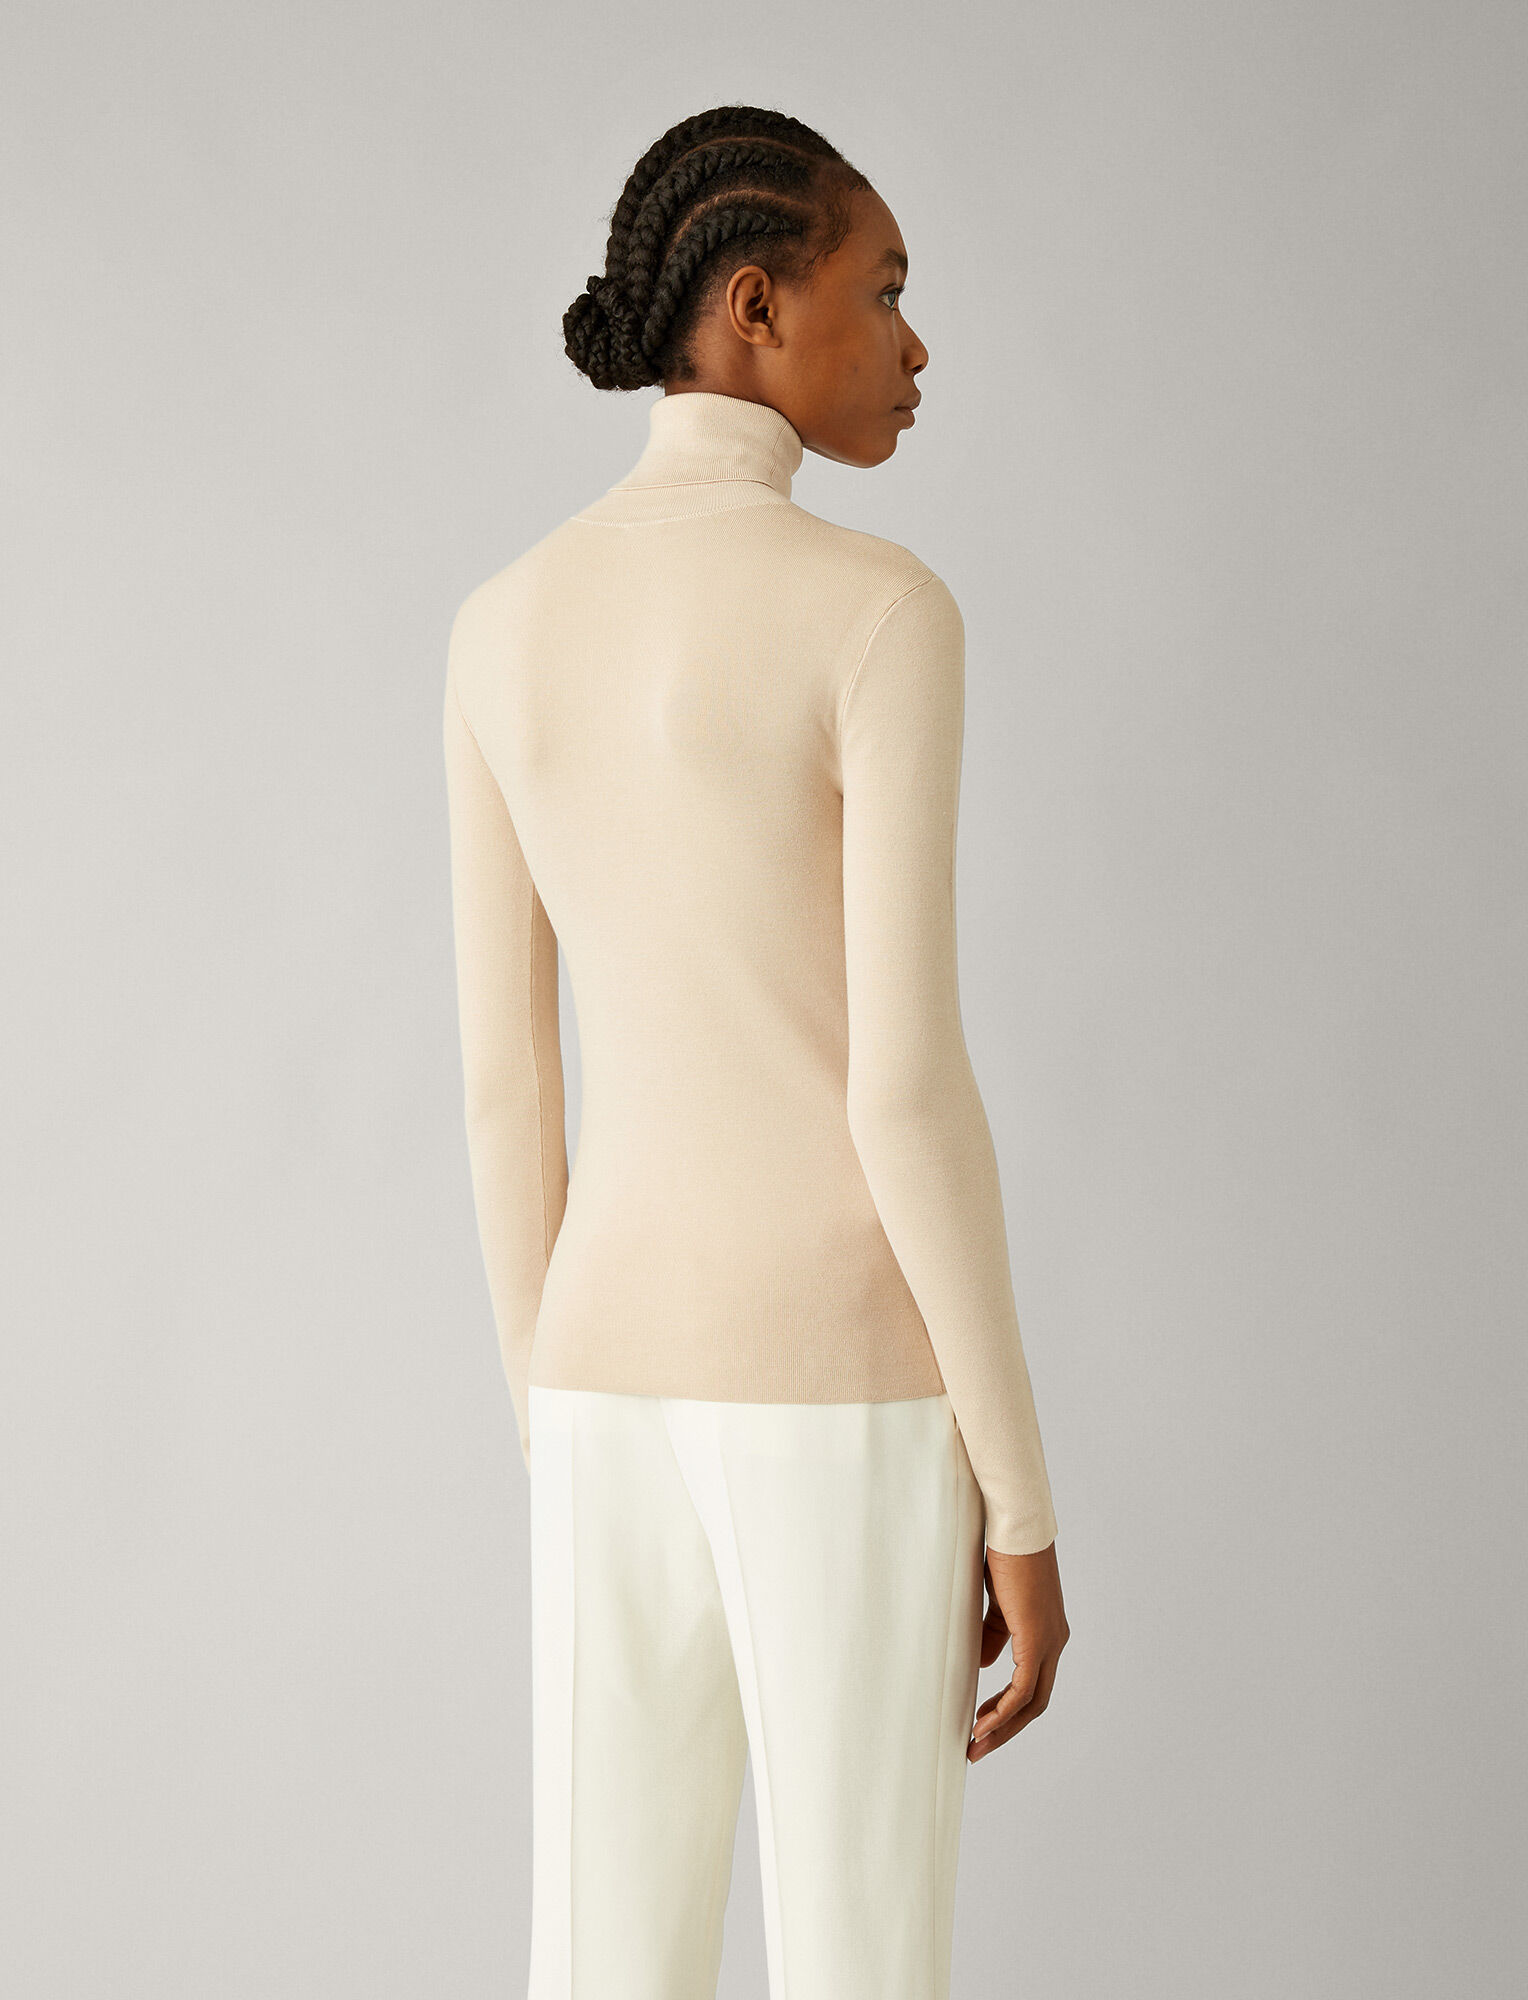 Joseph, Roll Neck Silk Stretch Knit, in LATTE